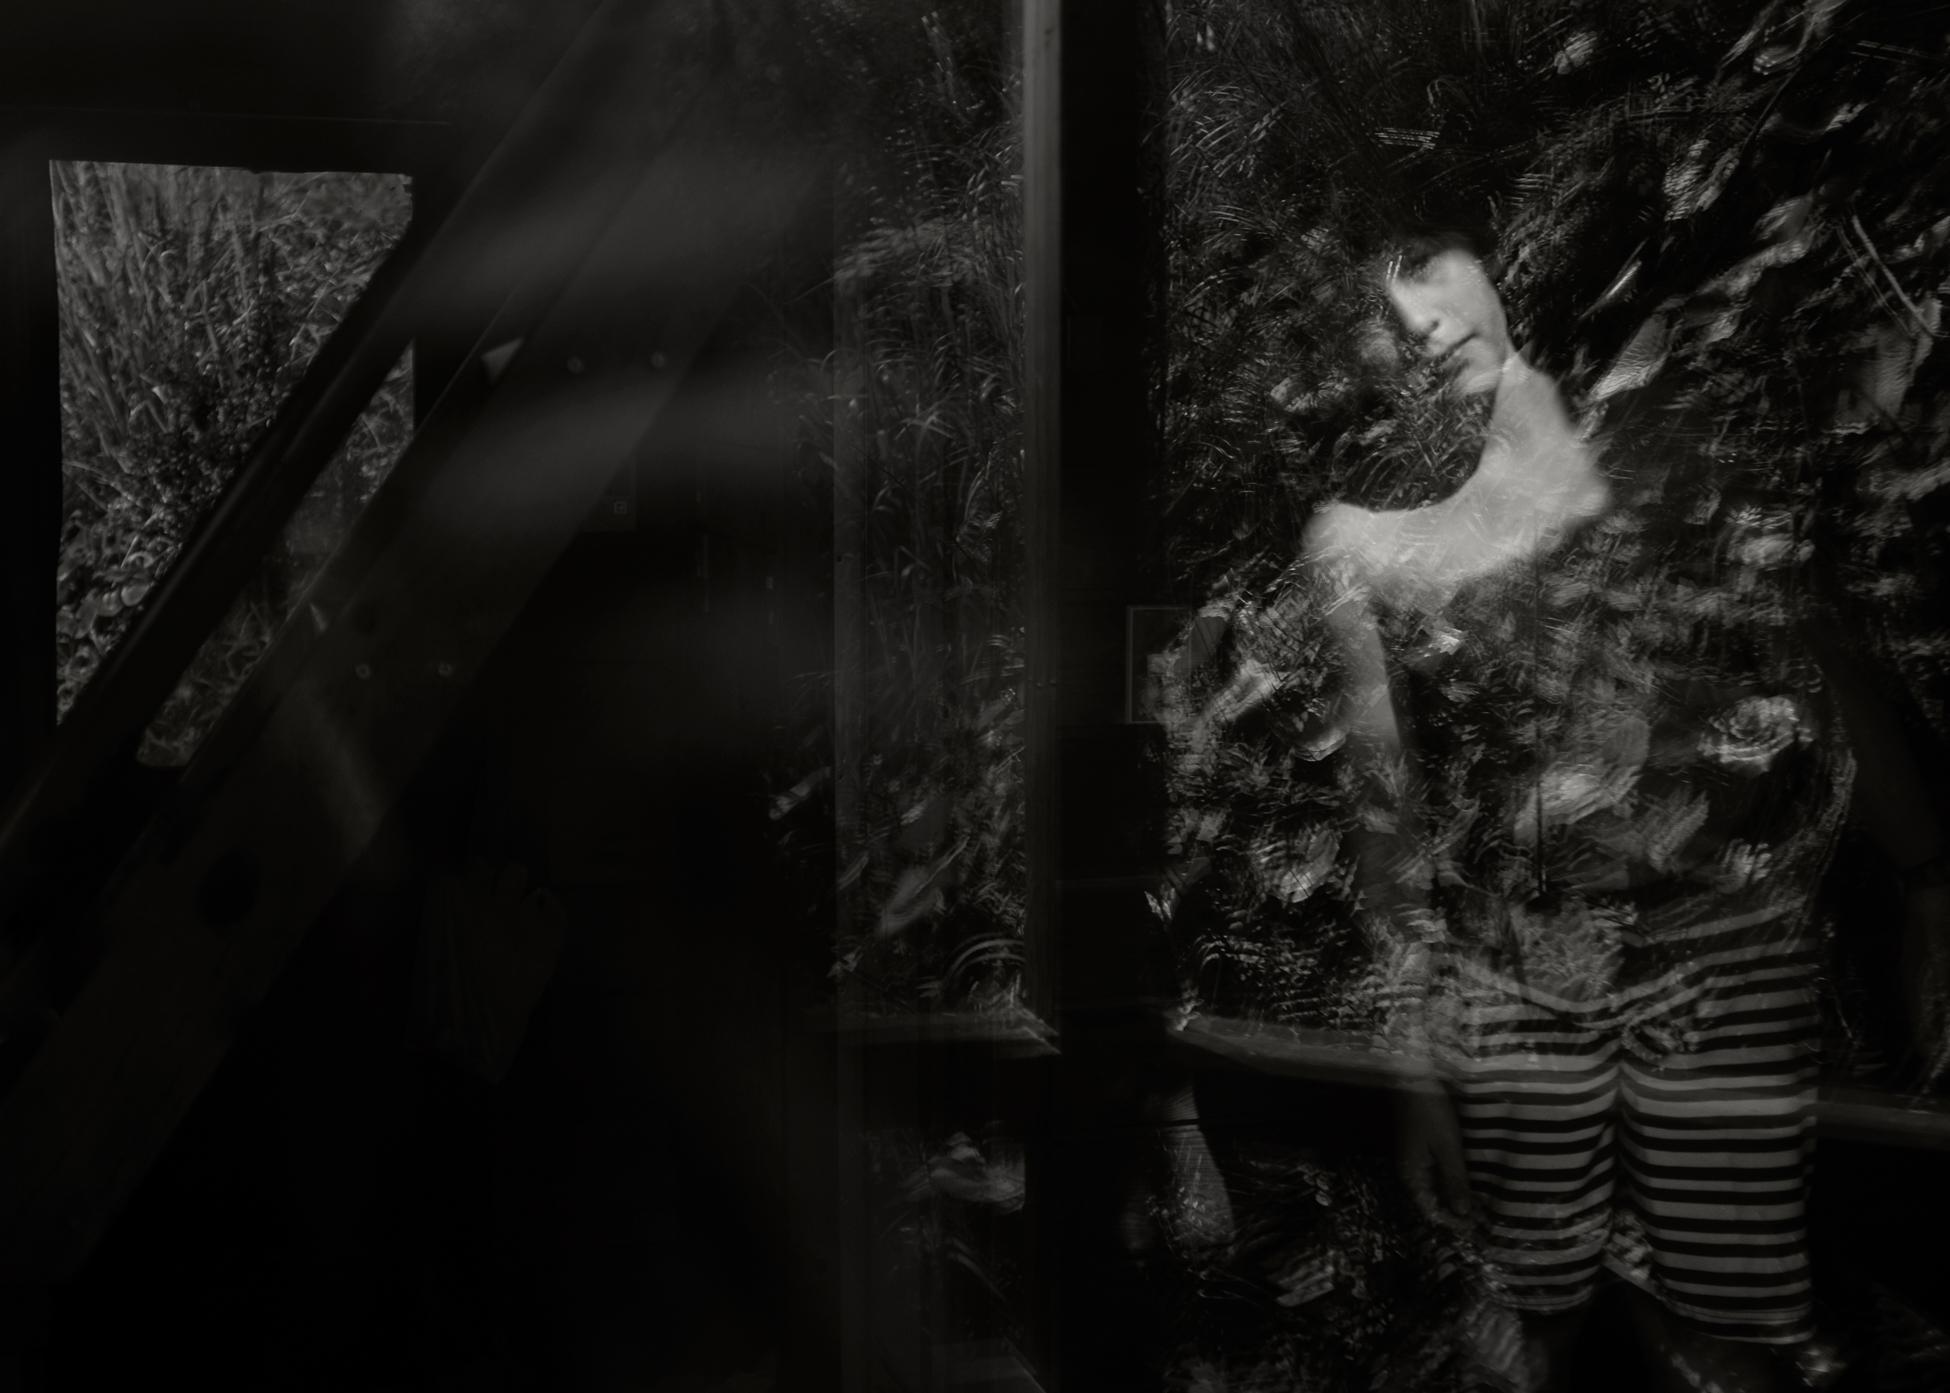 Reflection, Izu, Japan, 2015